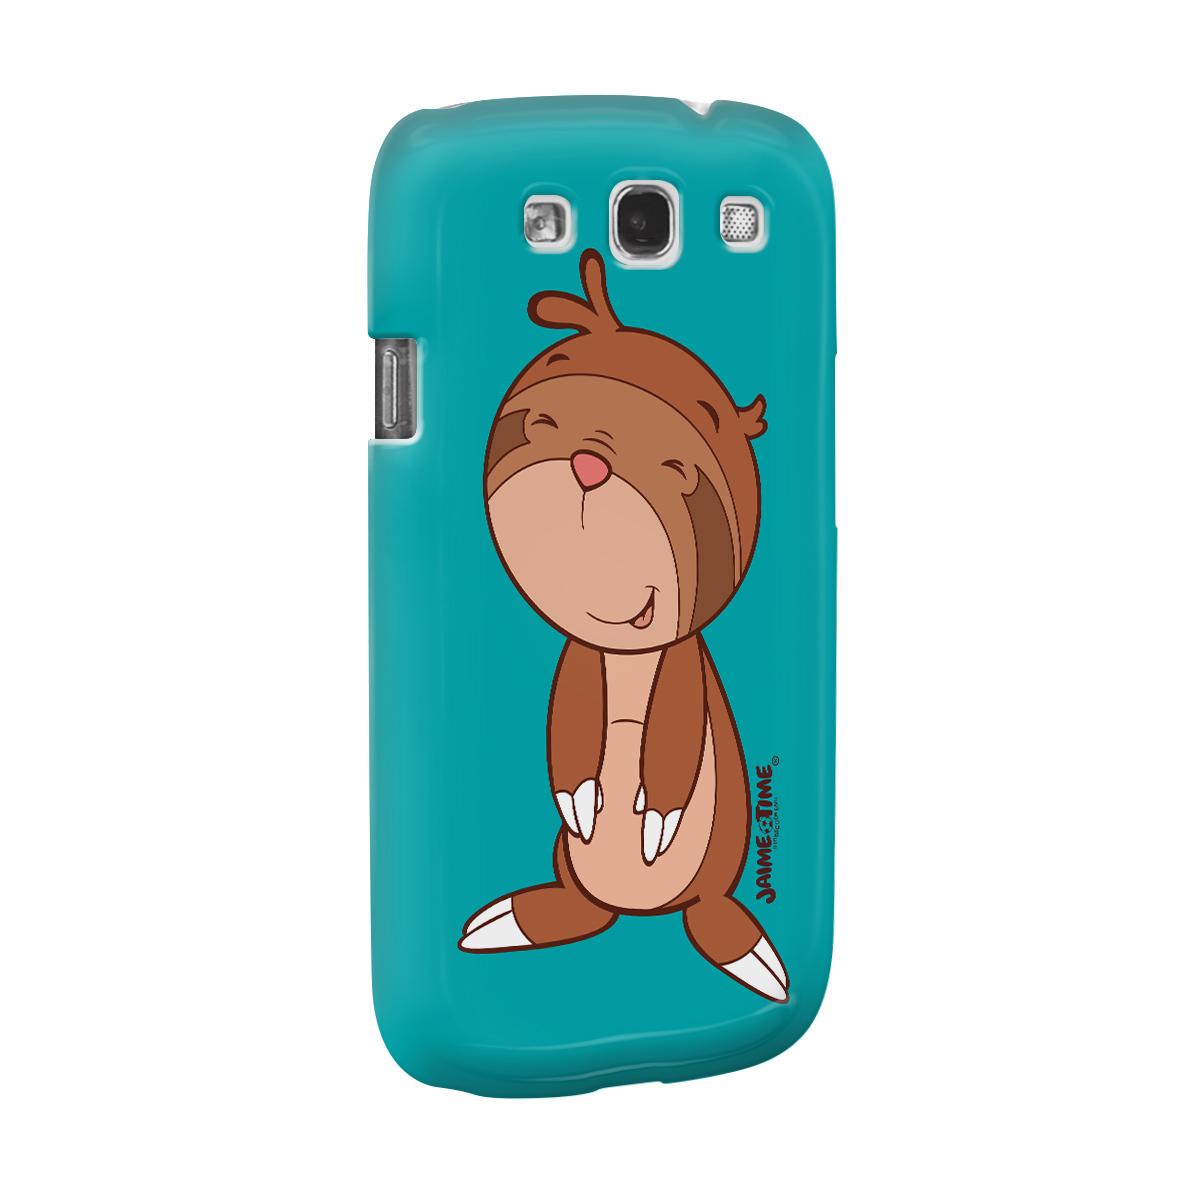 Capa para Samsung Galaxy S3 Jaime Mascote